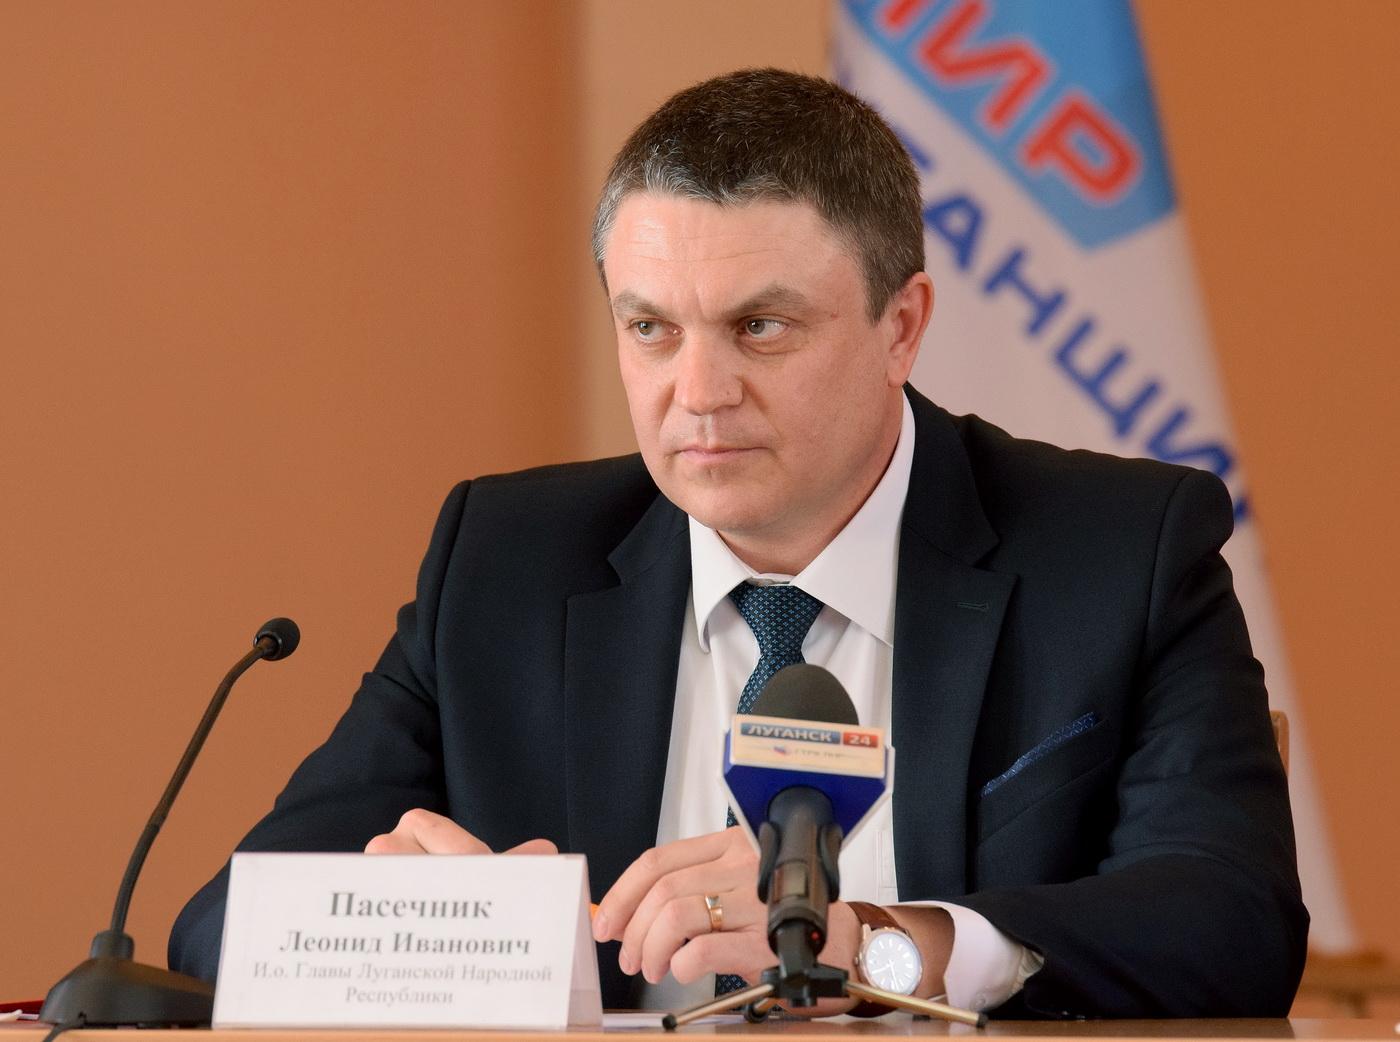 Леонид Пасечник глава ЛНР